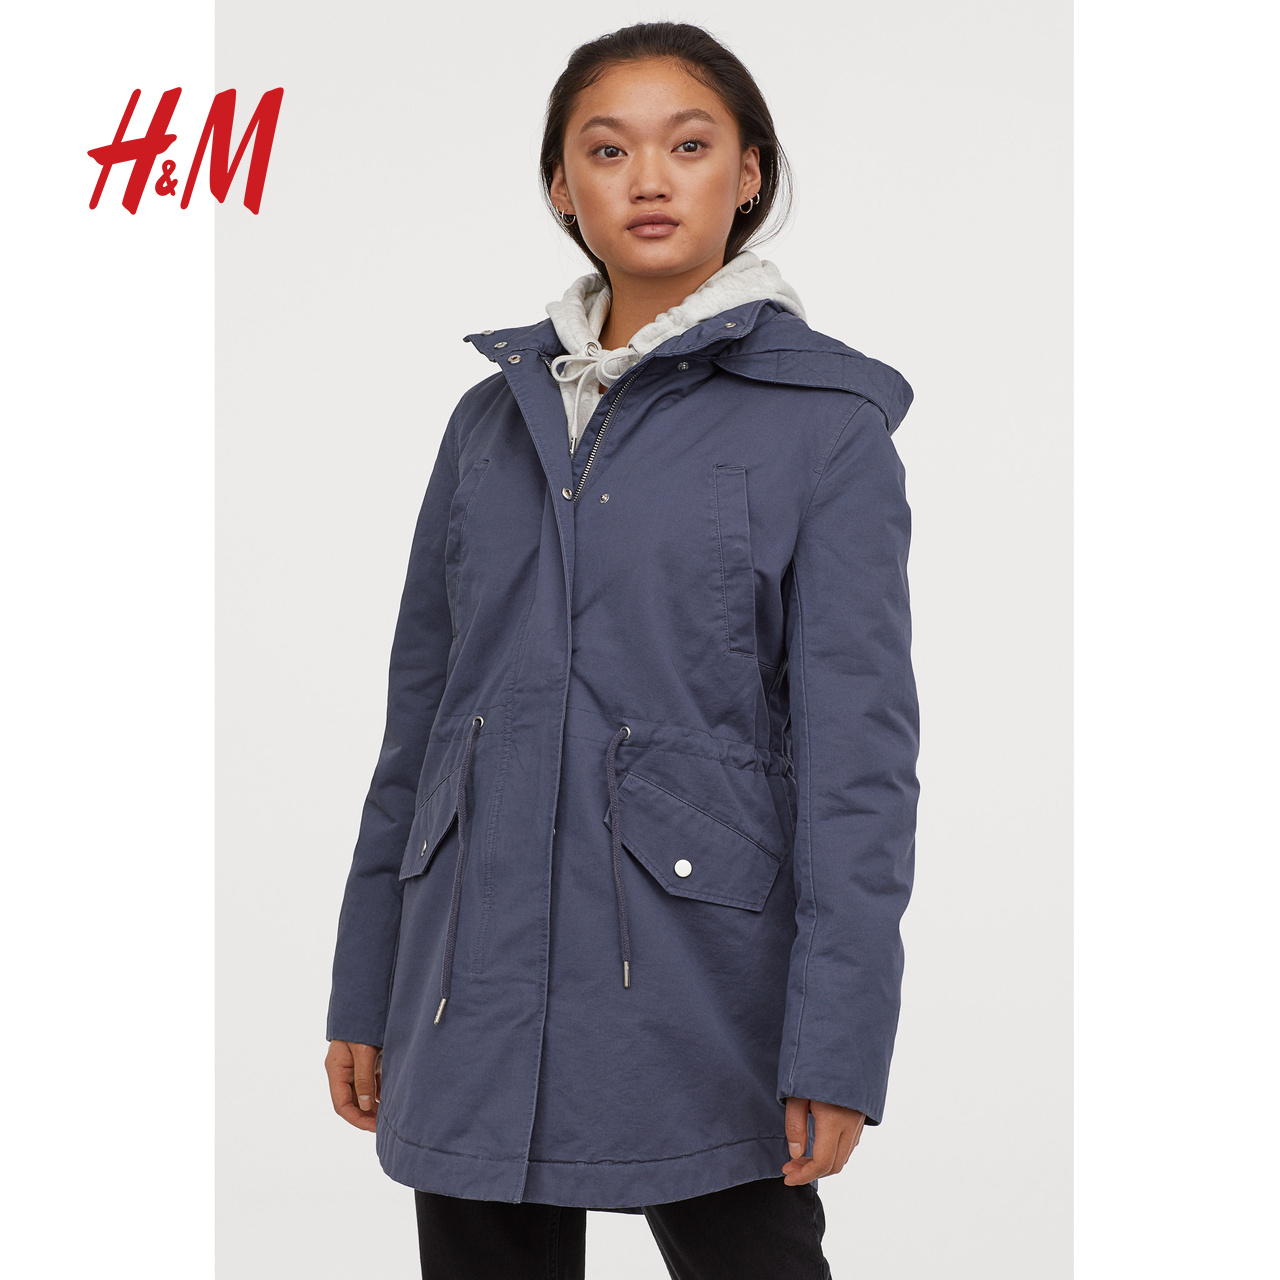 HM DIVIDED女装棉衣棉服机能风秋冬款夹棉外套派克大衣 0742561